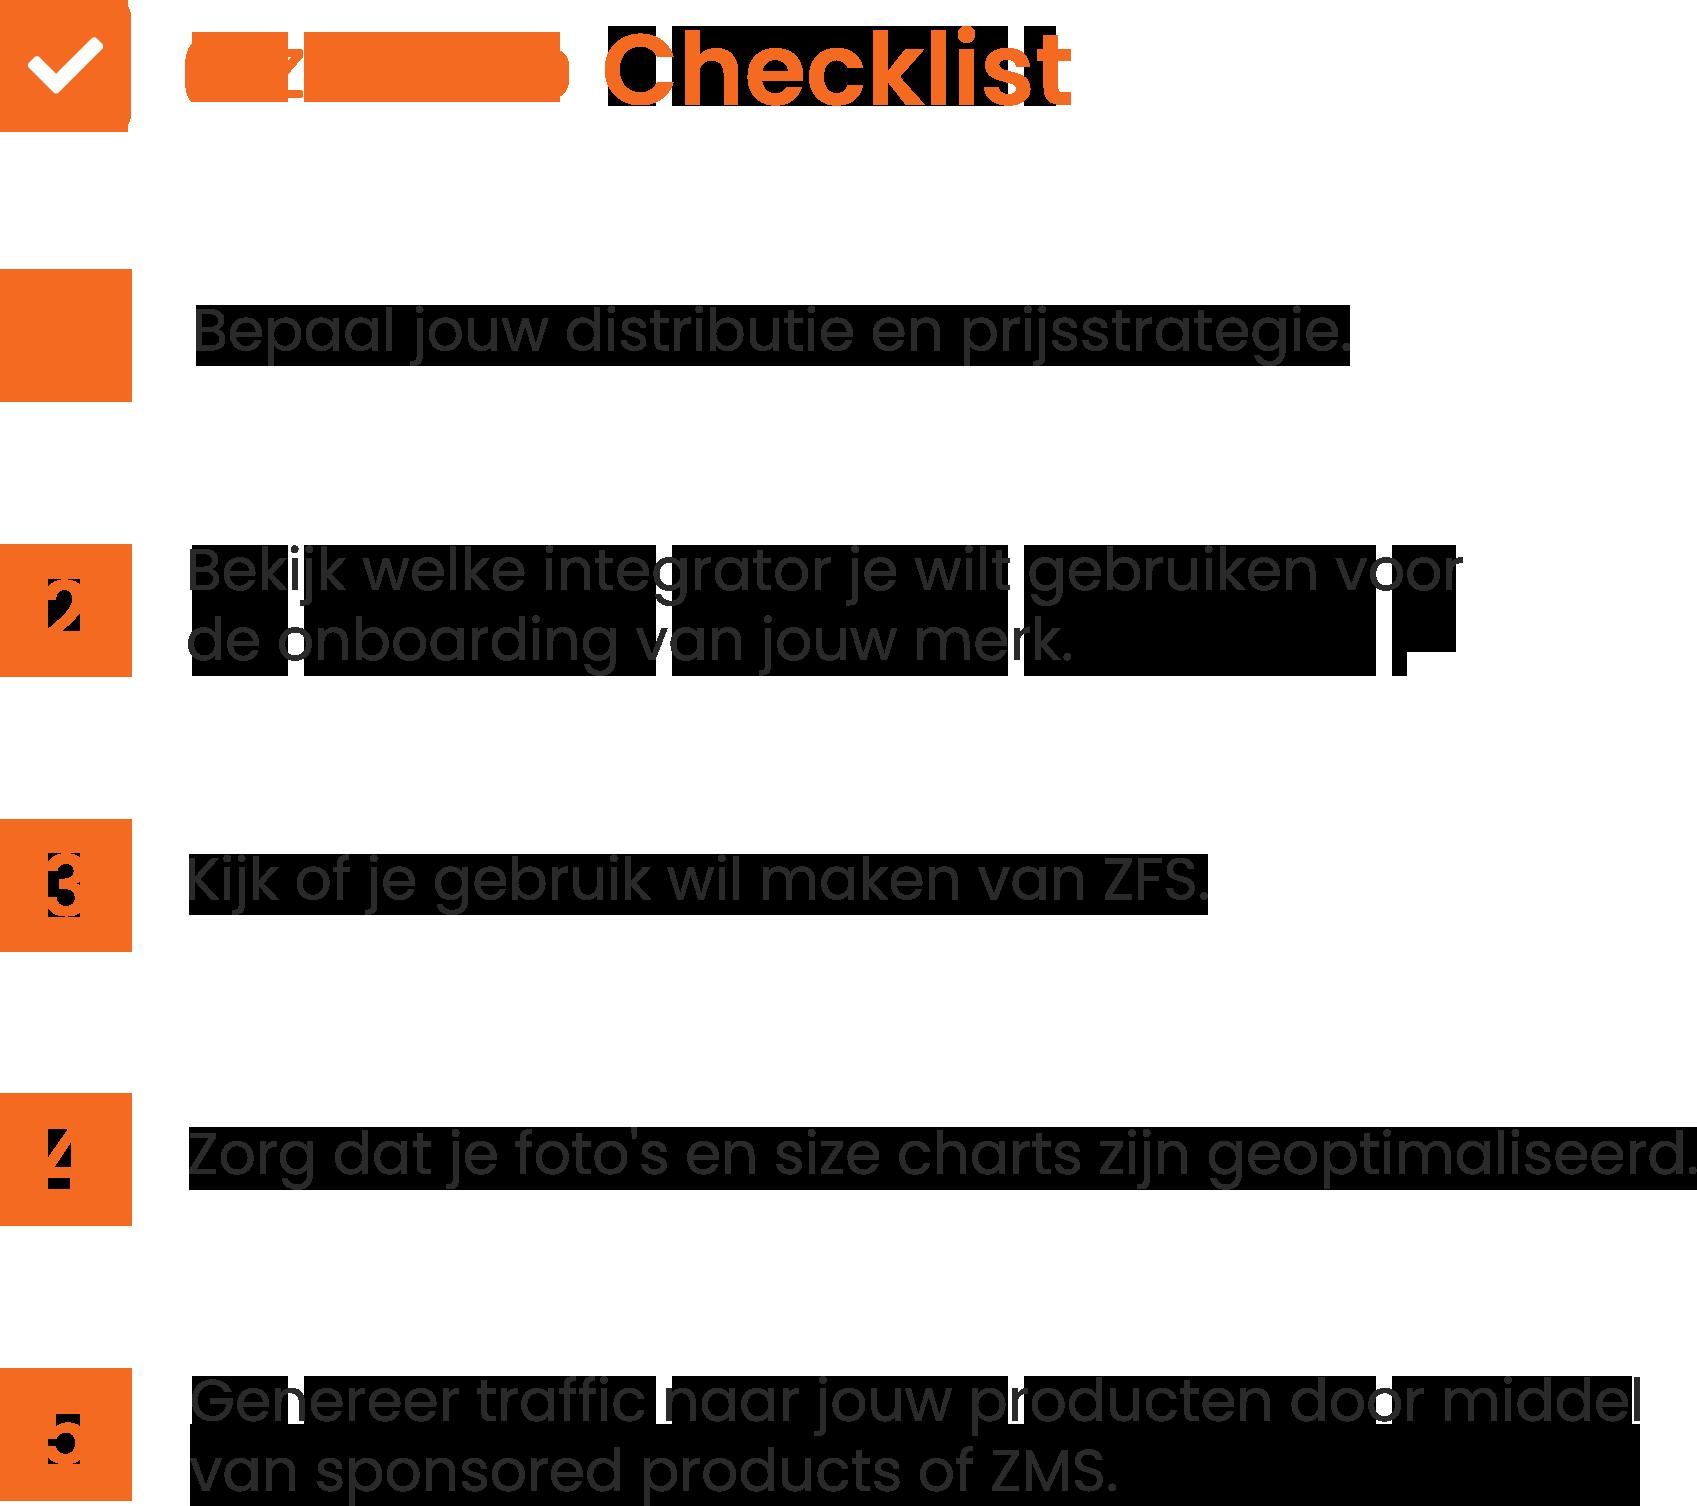 Brandsom Zalando checklist [2]